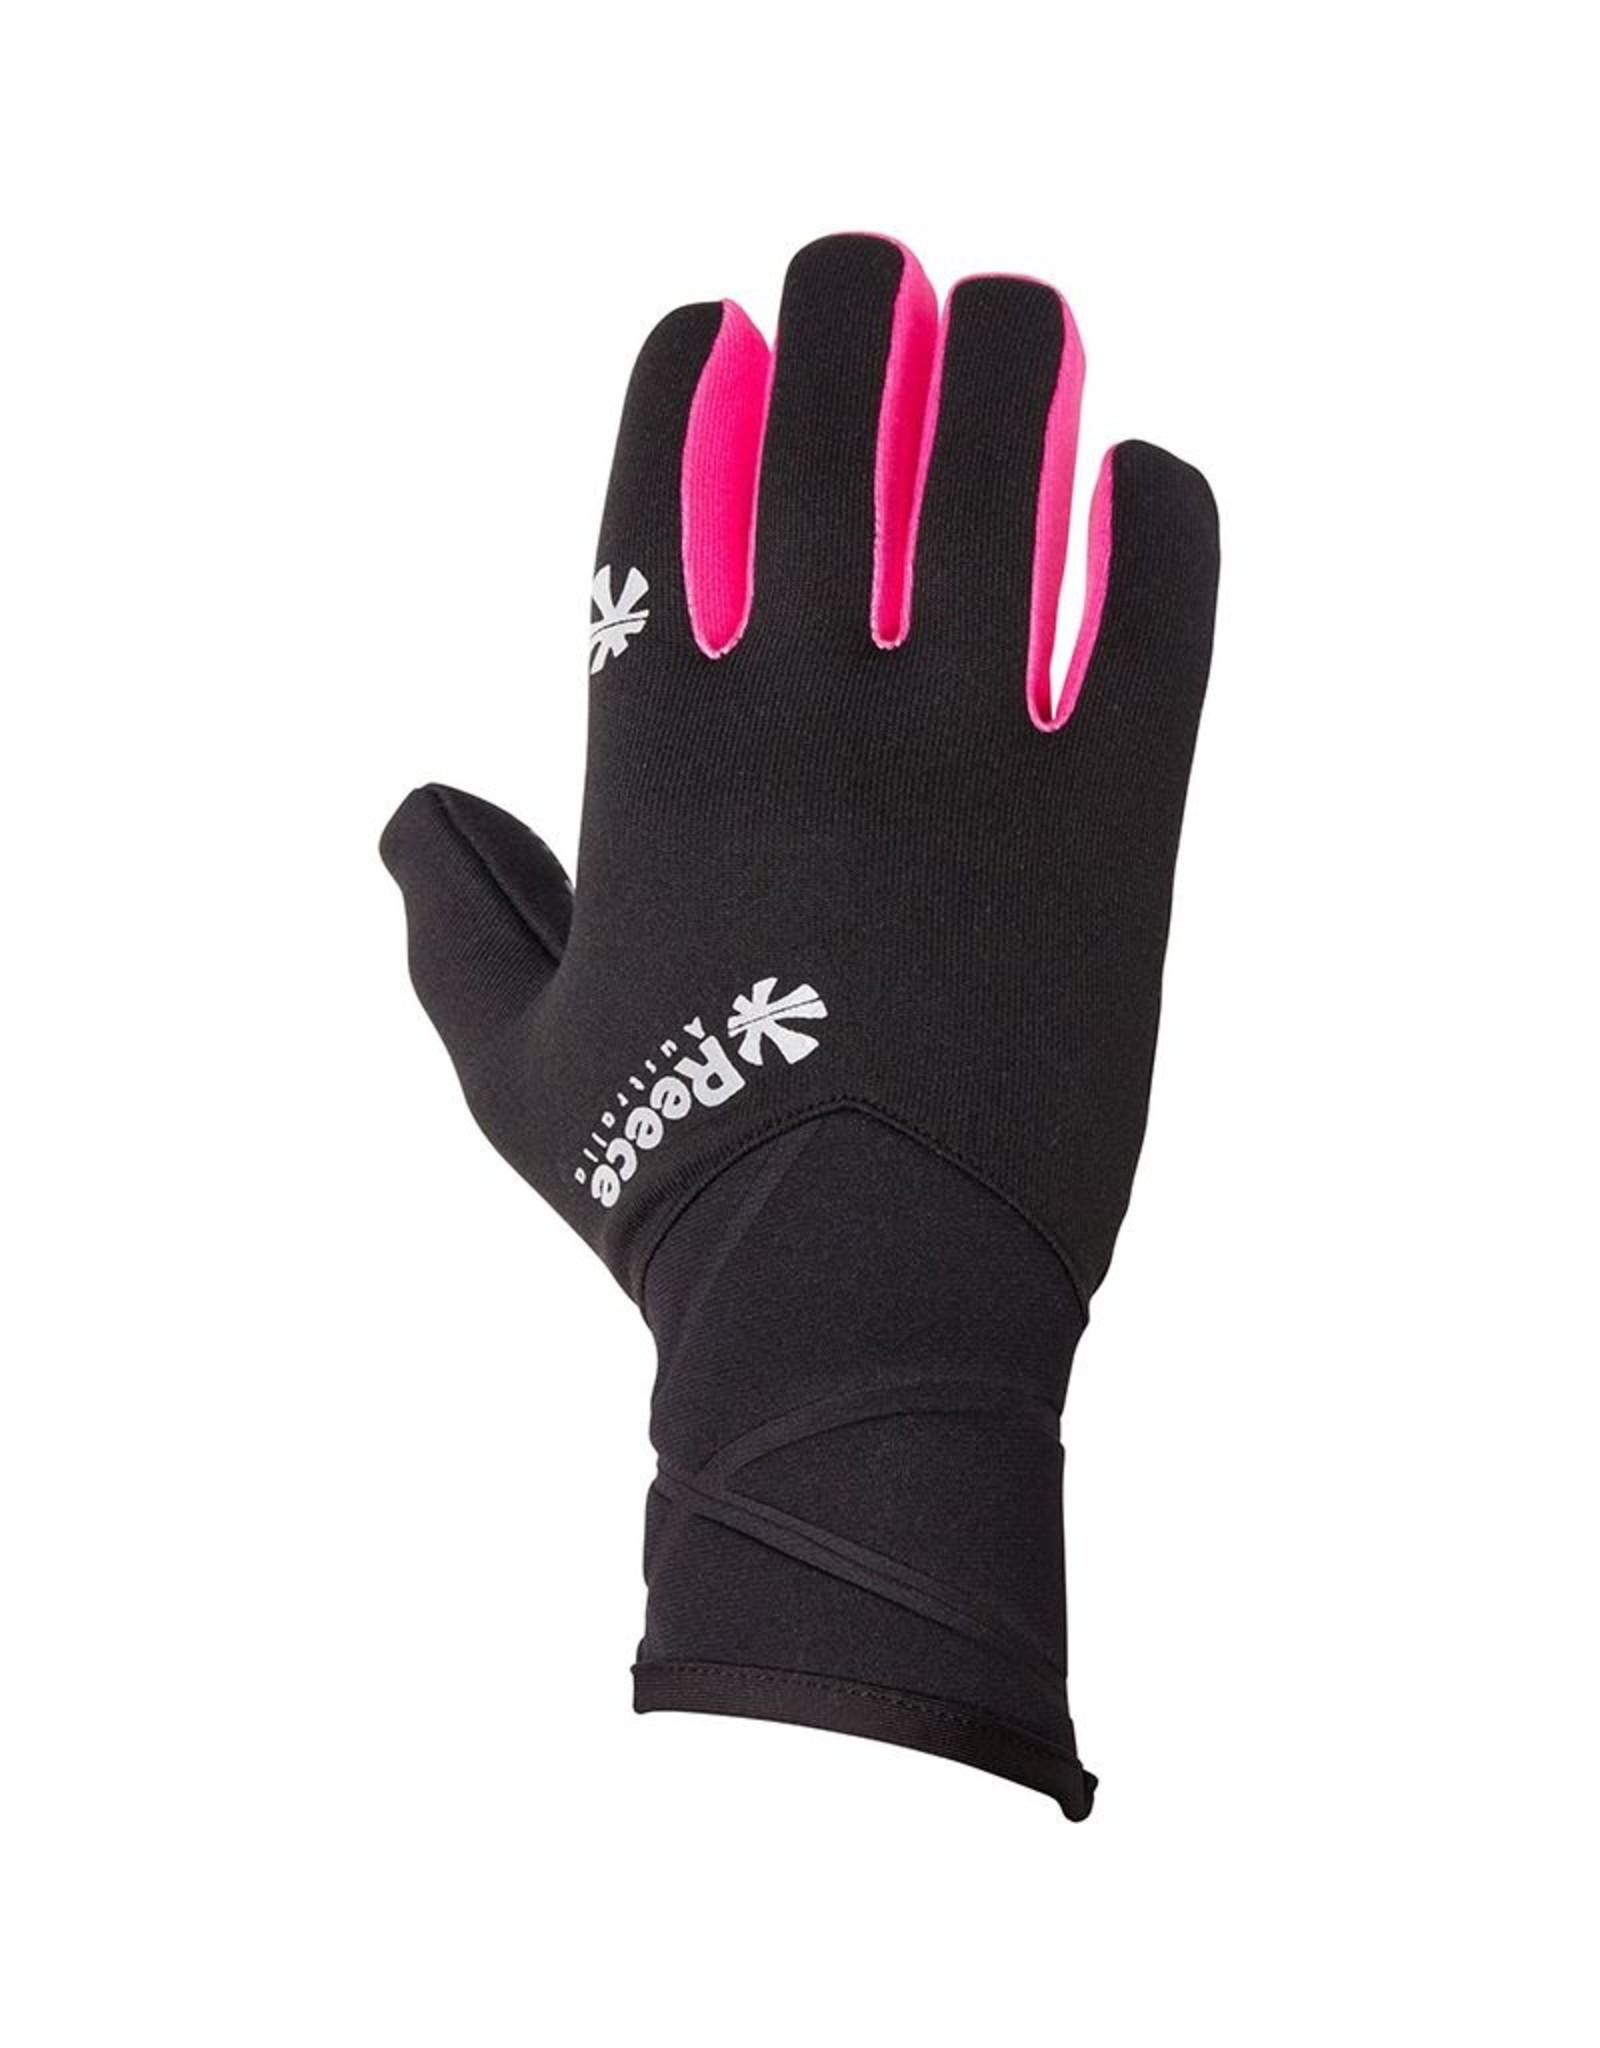 Reece Australia Power Player Glove